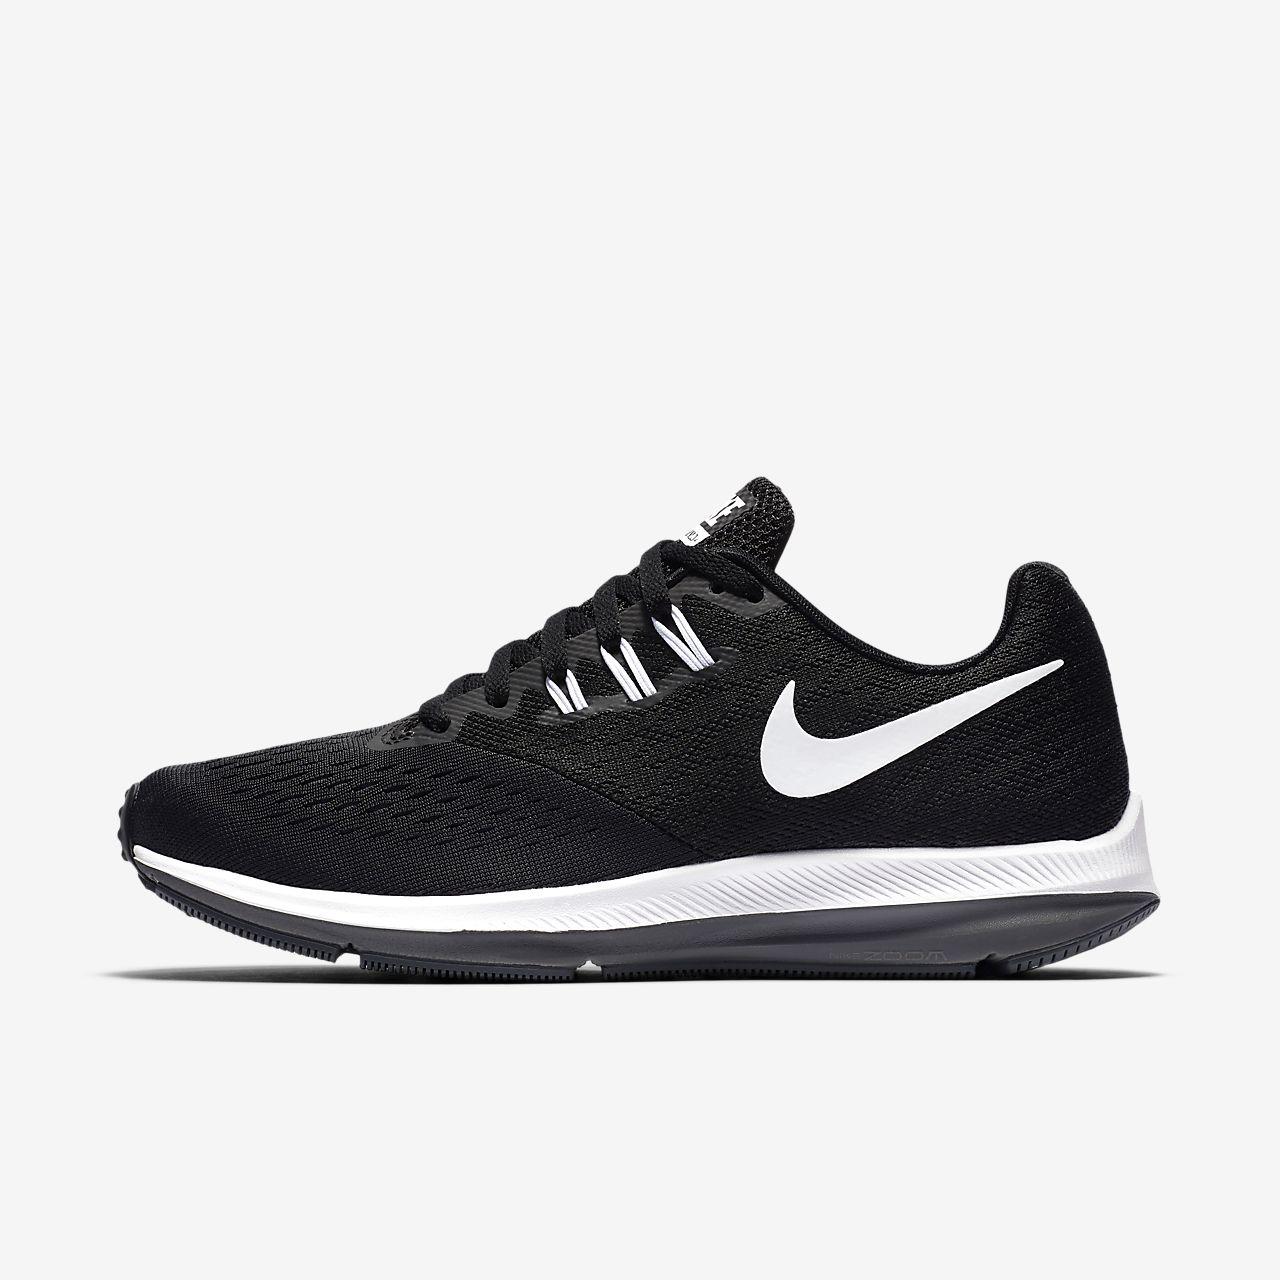 big sale 8030b 399ee Nike Zoom Winflo 4 Women's Running Shoe